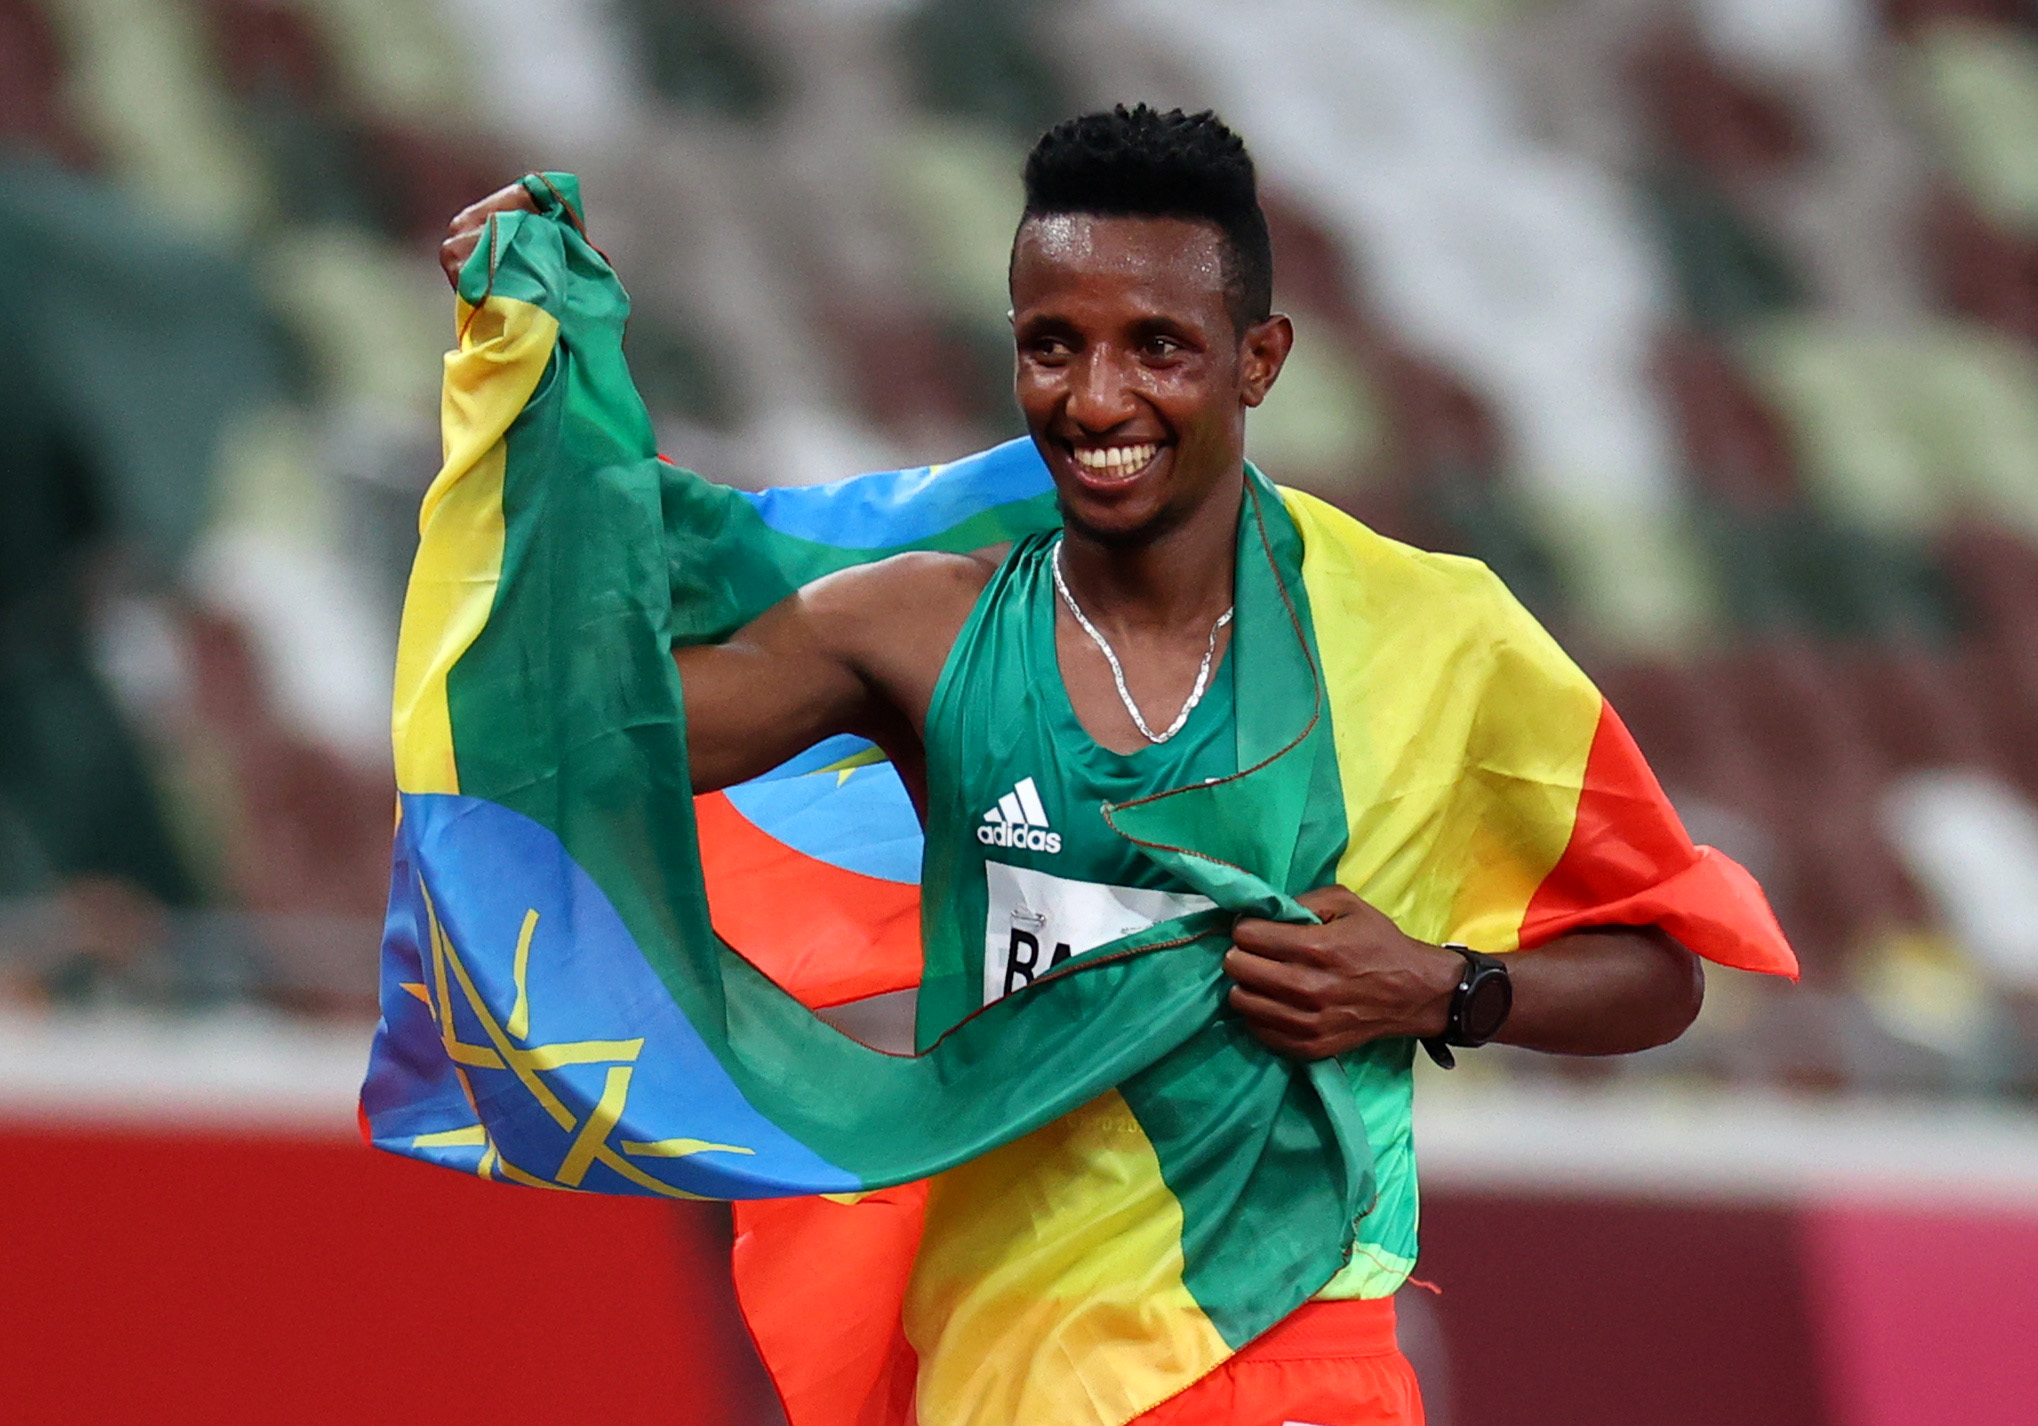 Tokyo 2020 Olympics - Athletics - Men's 10000m - OLS - Olympic Stadium, Tokyo, Japan - July 30, 2021. Selemon Barega of Ethiopia celebrates after winning the final REUTERS/Lucy Nicholson